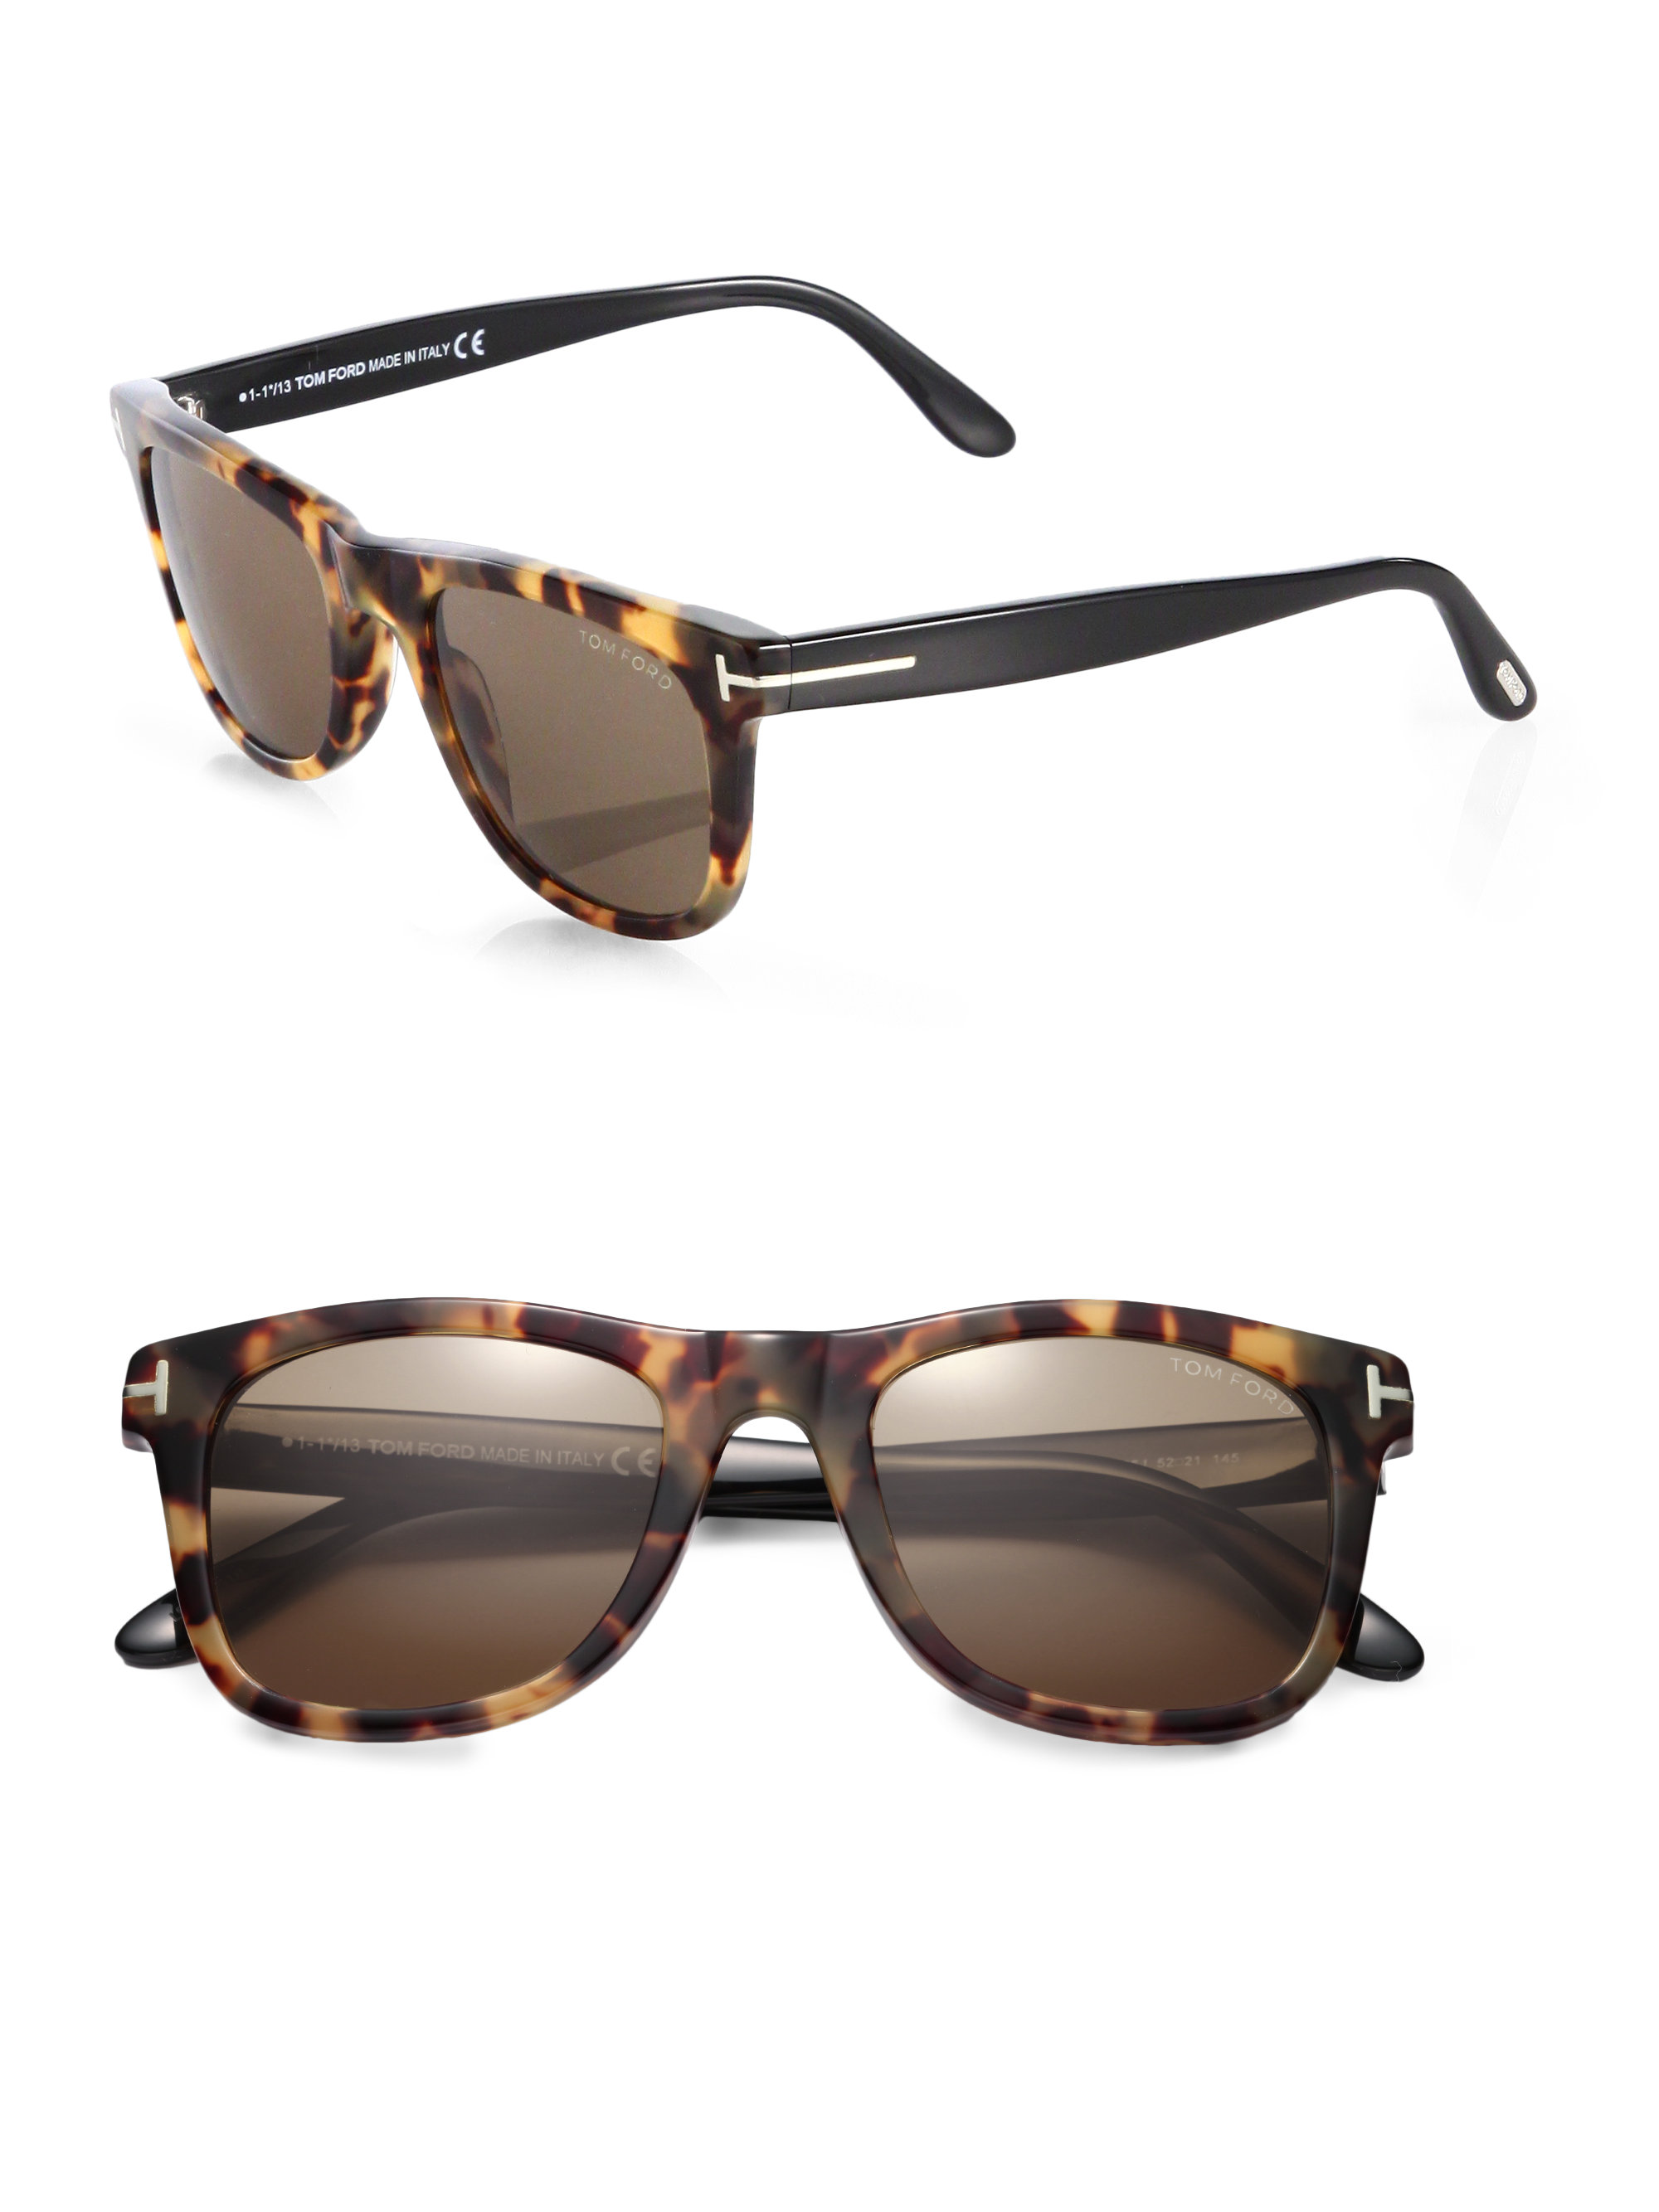 bfcff77465 Tom Ford Leo Oversized Square Sunglasses - Lyst